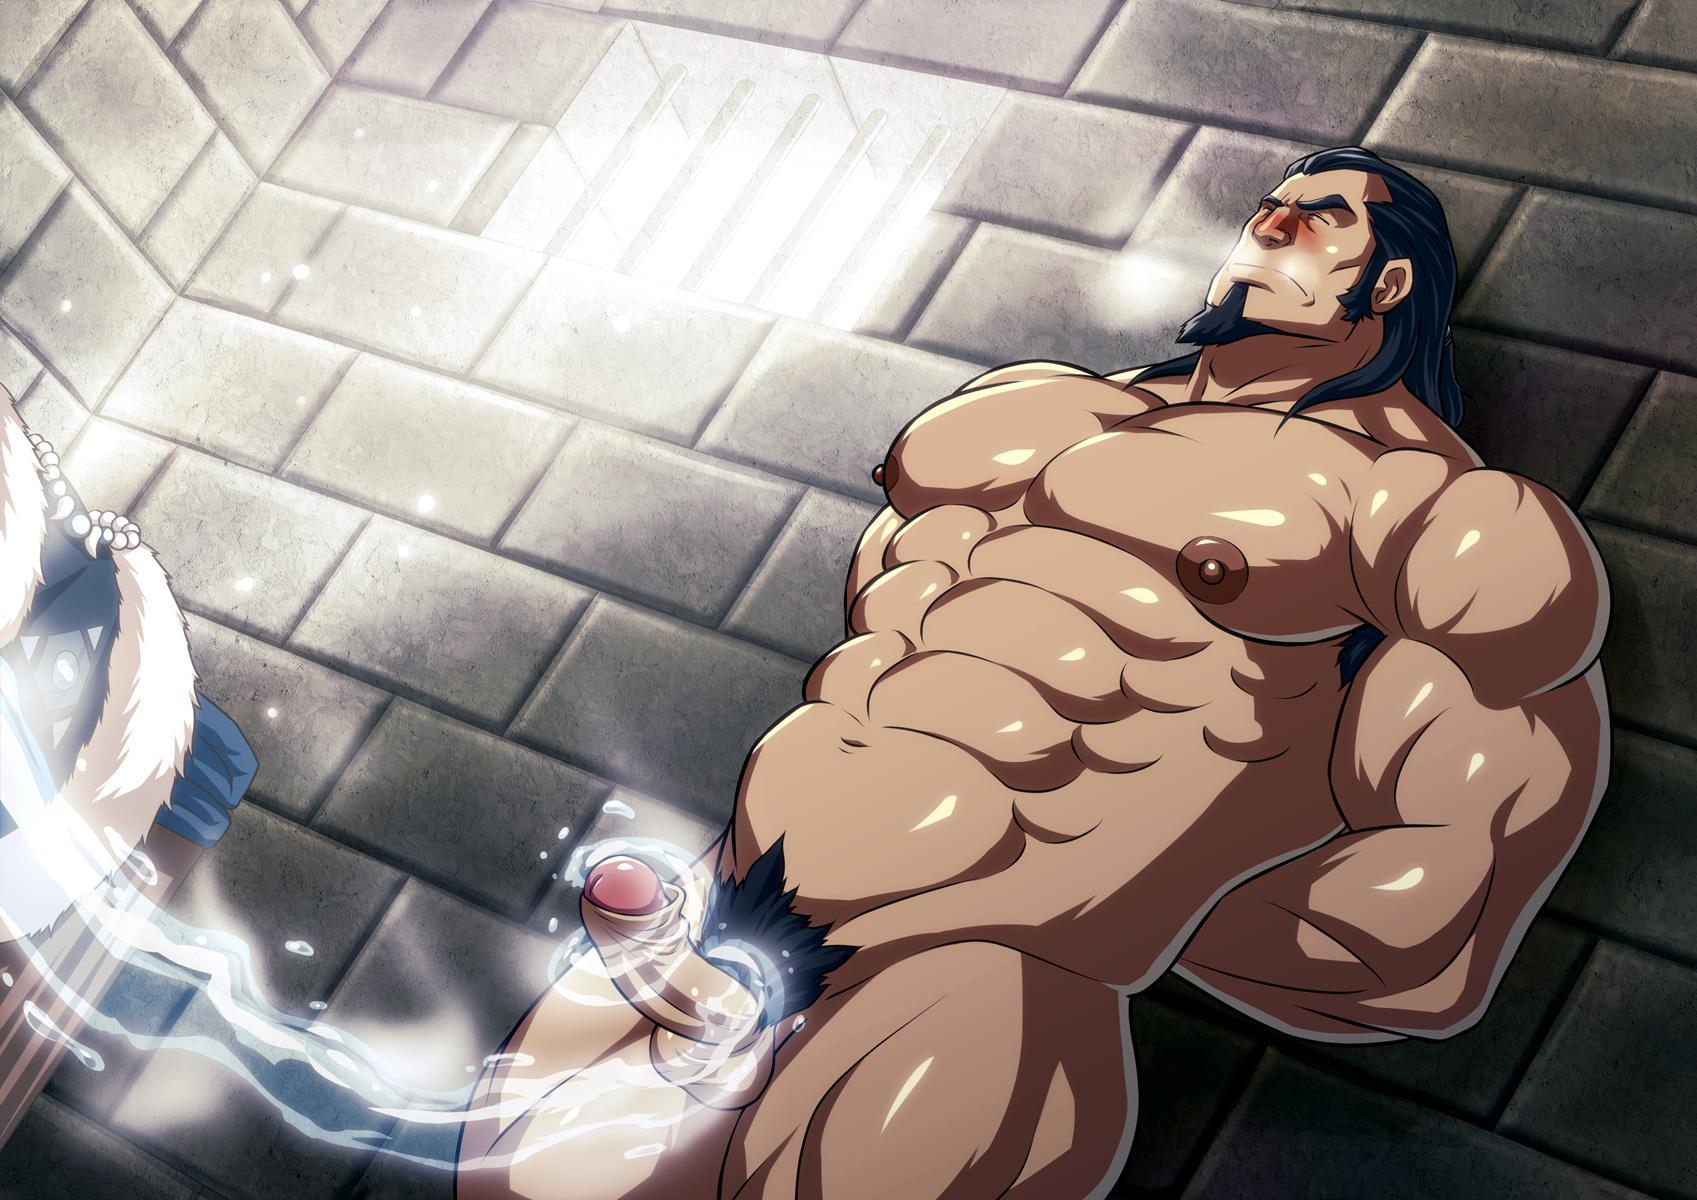 Avatar Herr Der Elemente Porn avatar yaoi porn gallery - cartoonboner